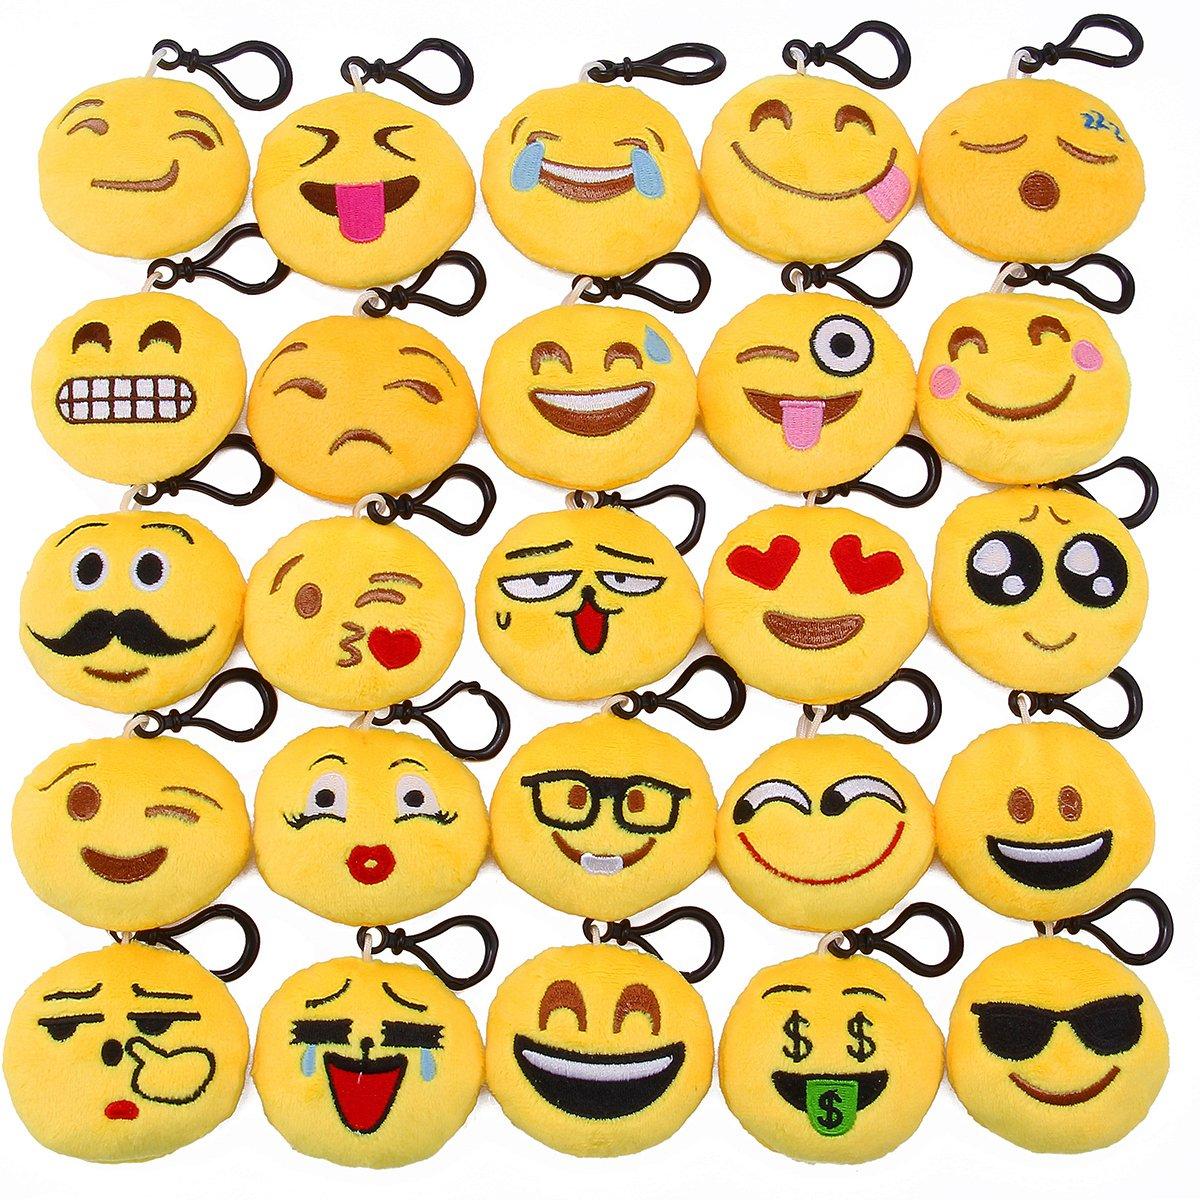 Lenink Emoji Party Supplies,25 Pack Emoji Keychain,Mini Plush Emoji  Pillows,Emoji Party Favors for Kids Backpacks and Bags Decorations